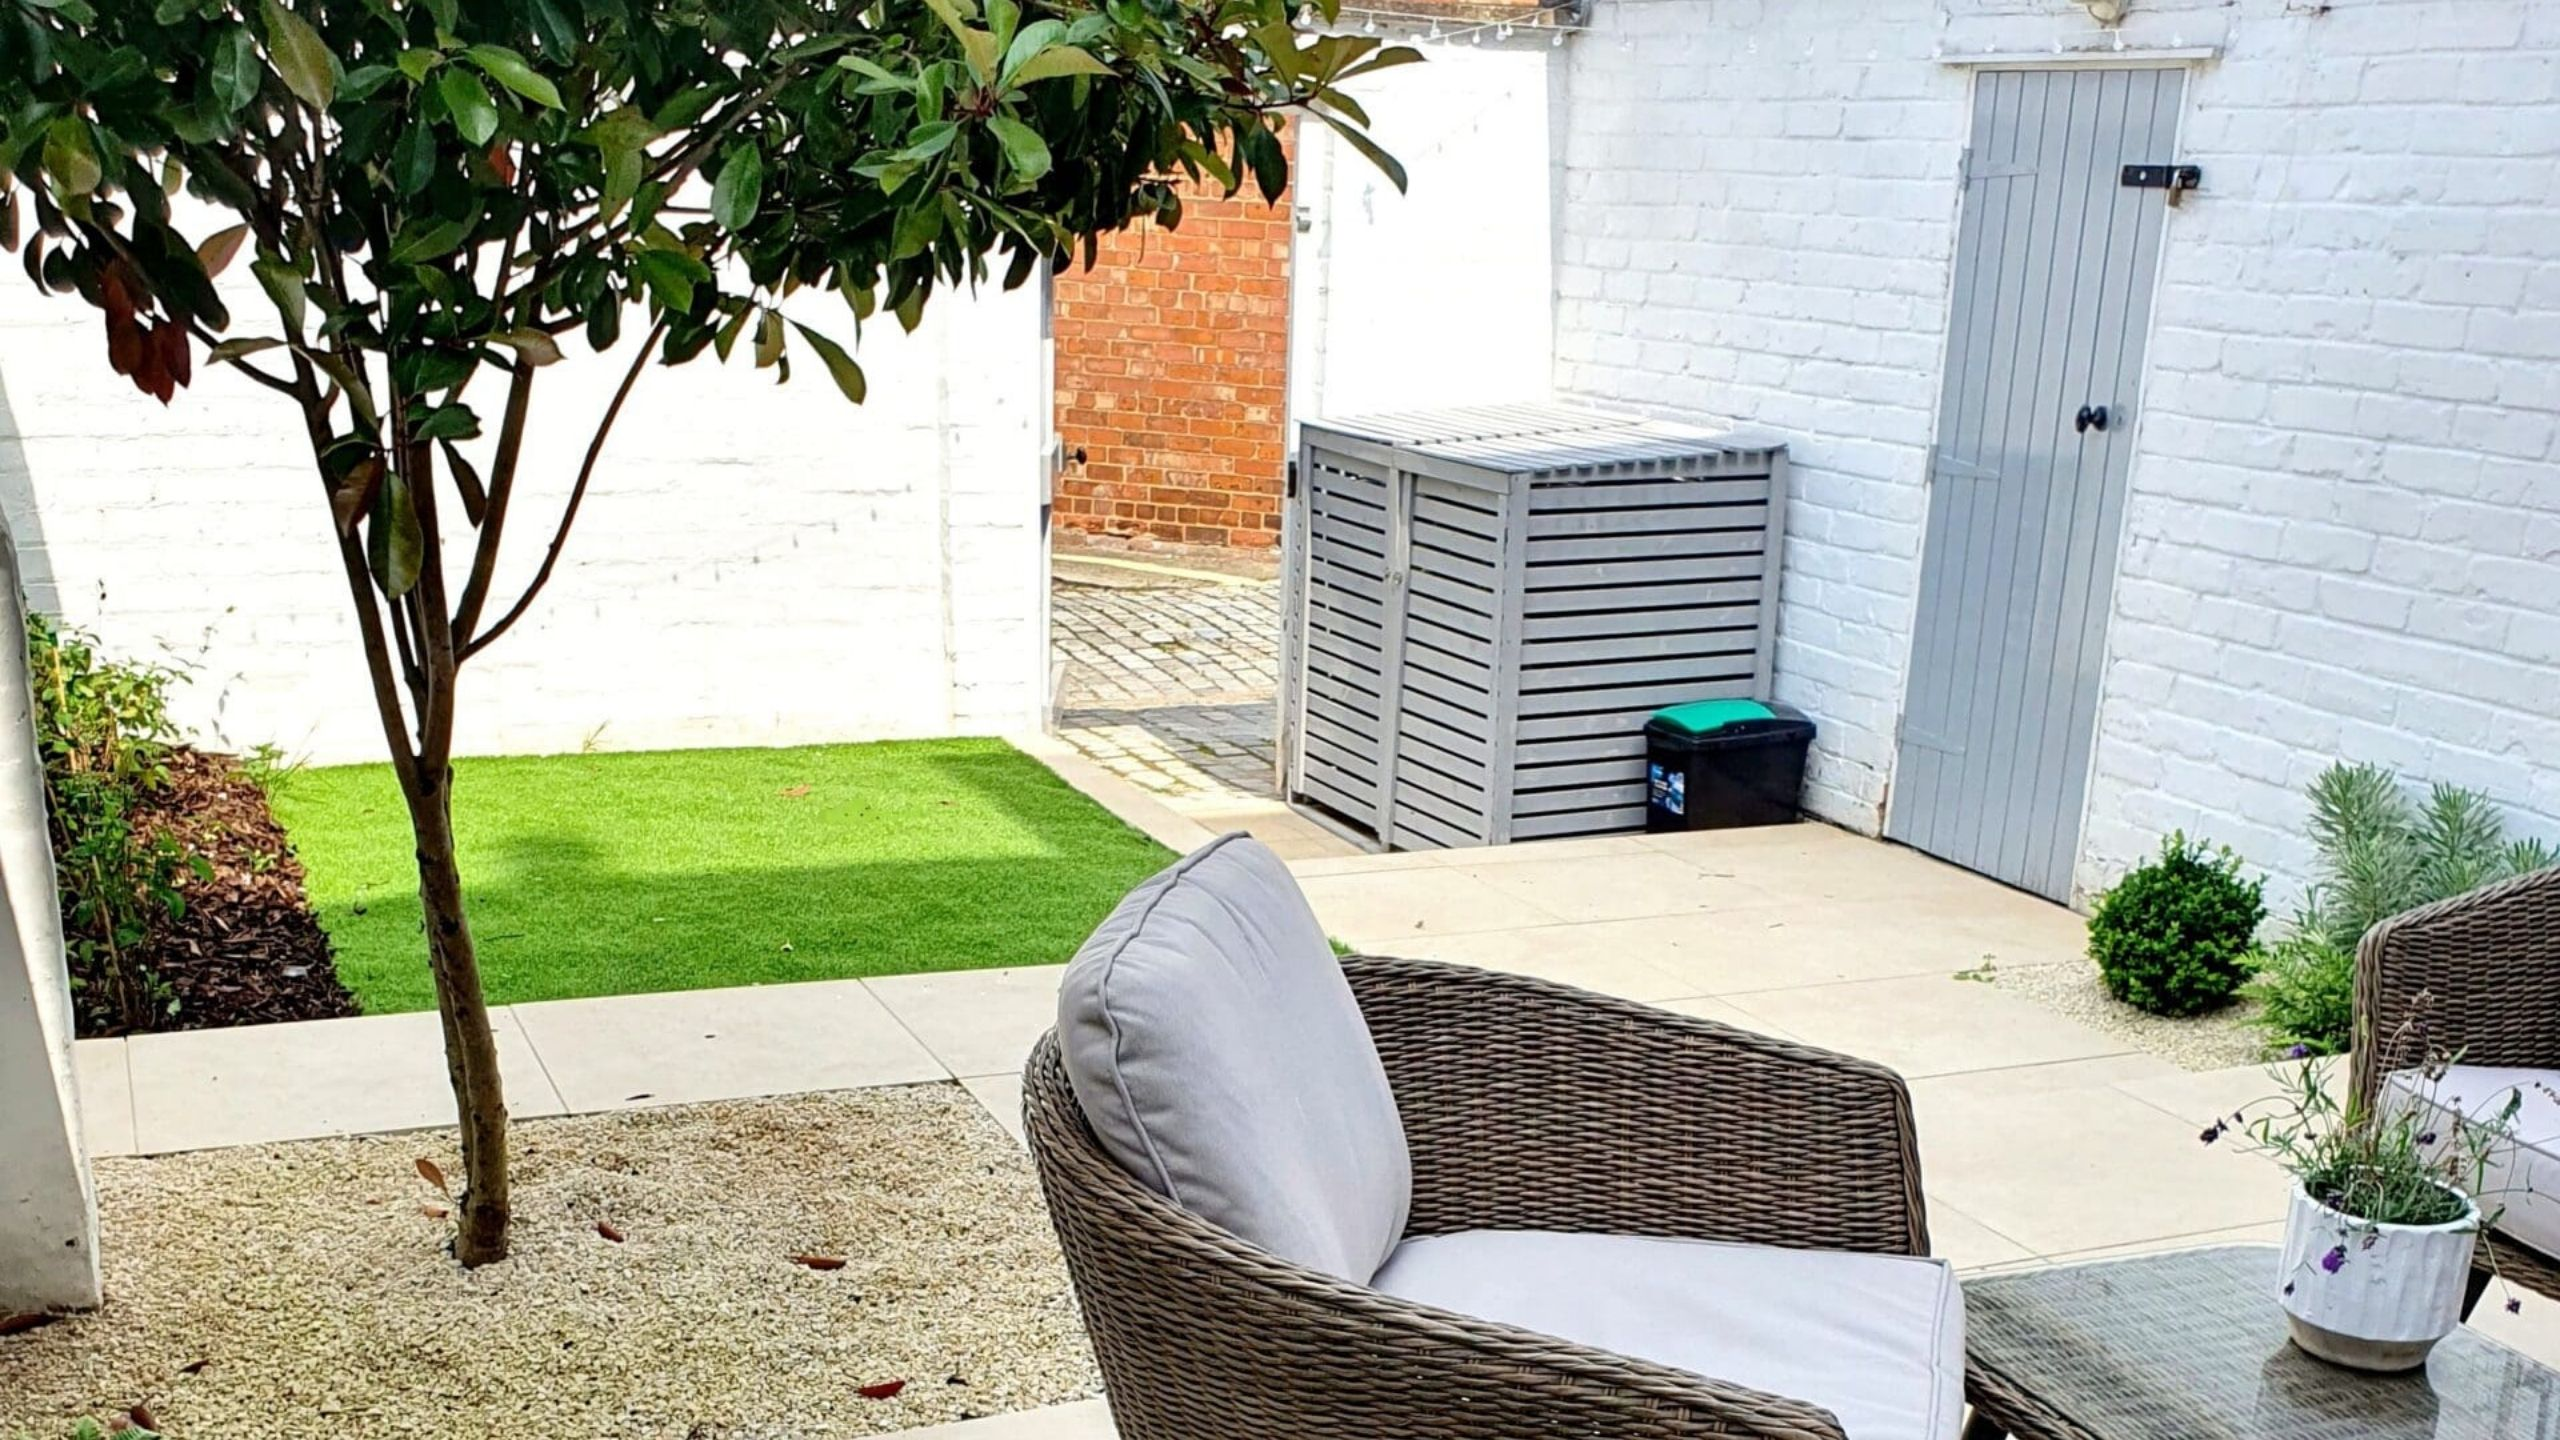 sam-nattress-gardens-projects-landscape-design-darlington-courtyard-garden-design